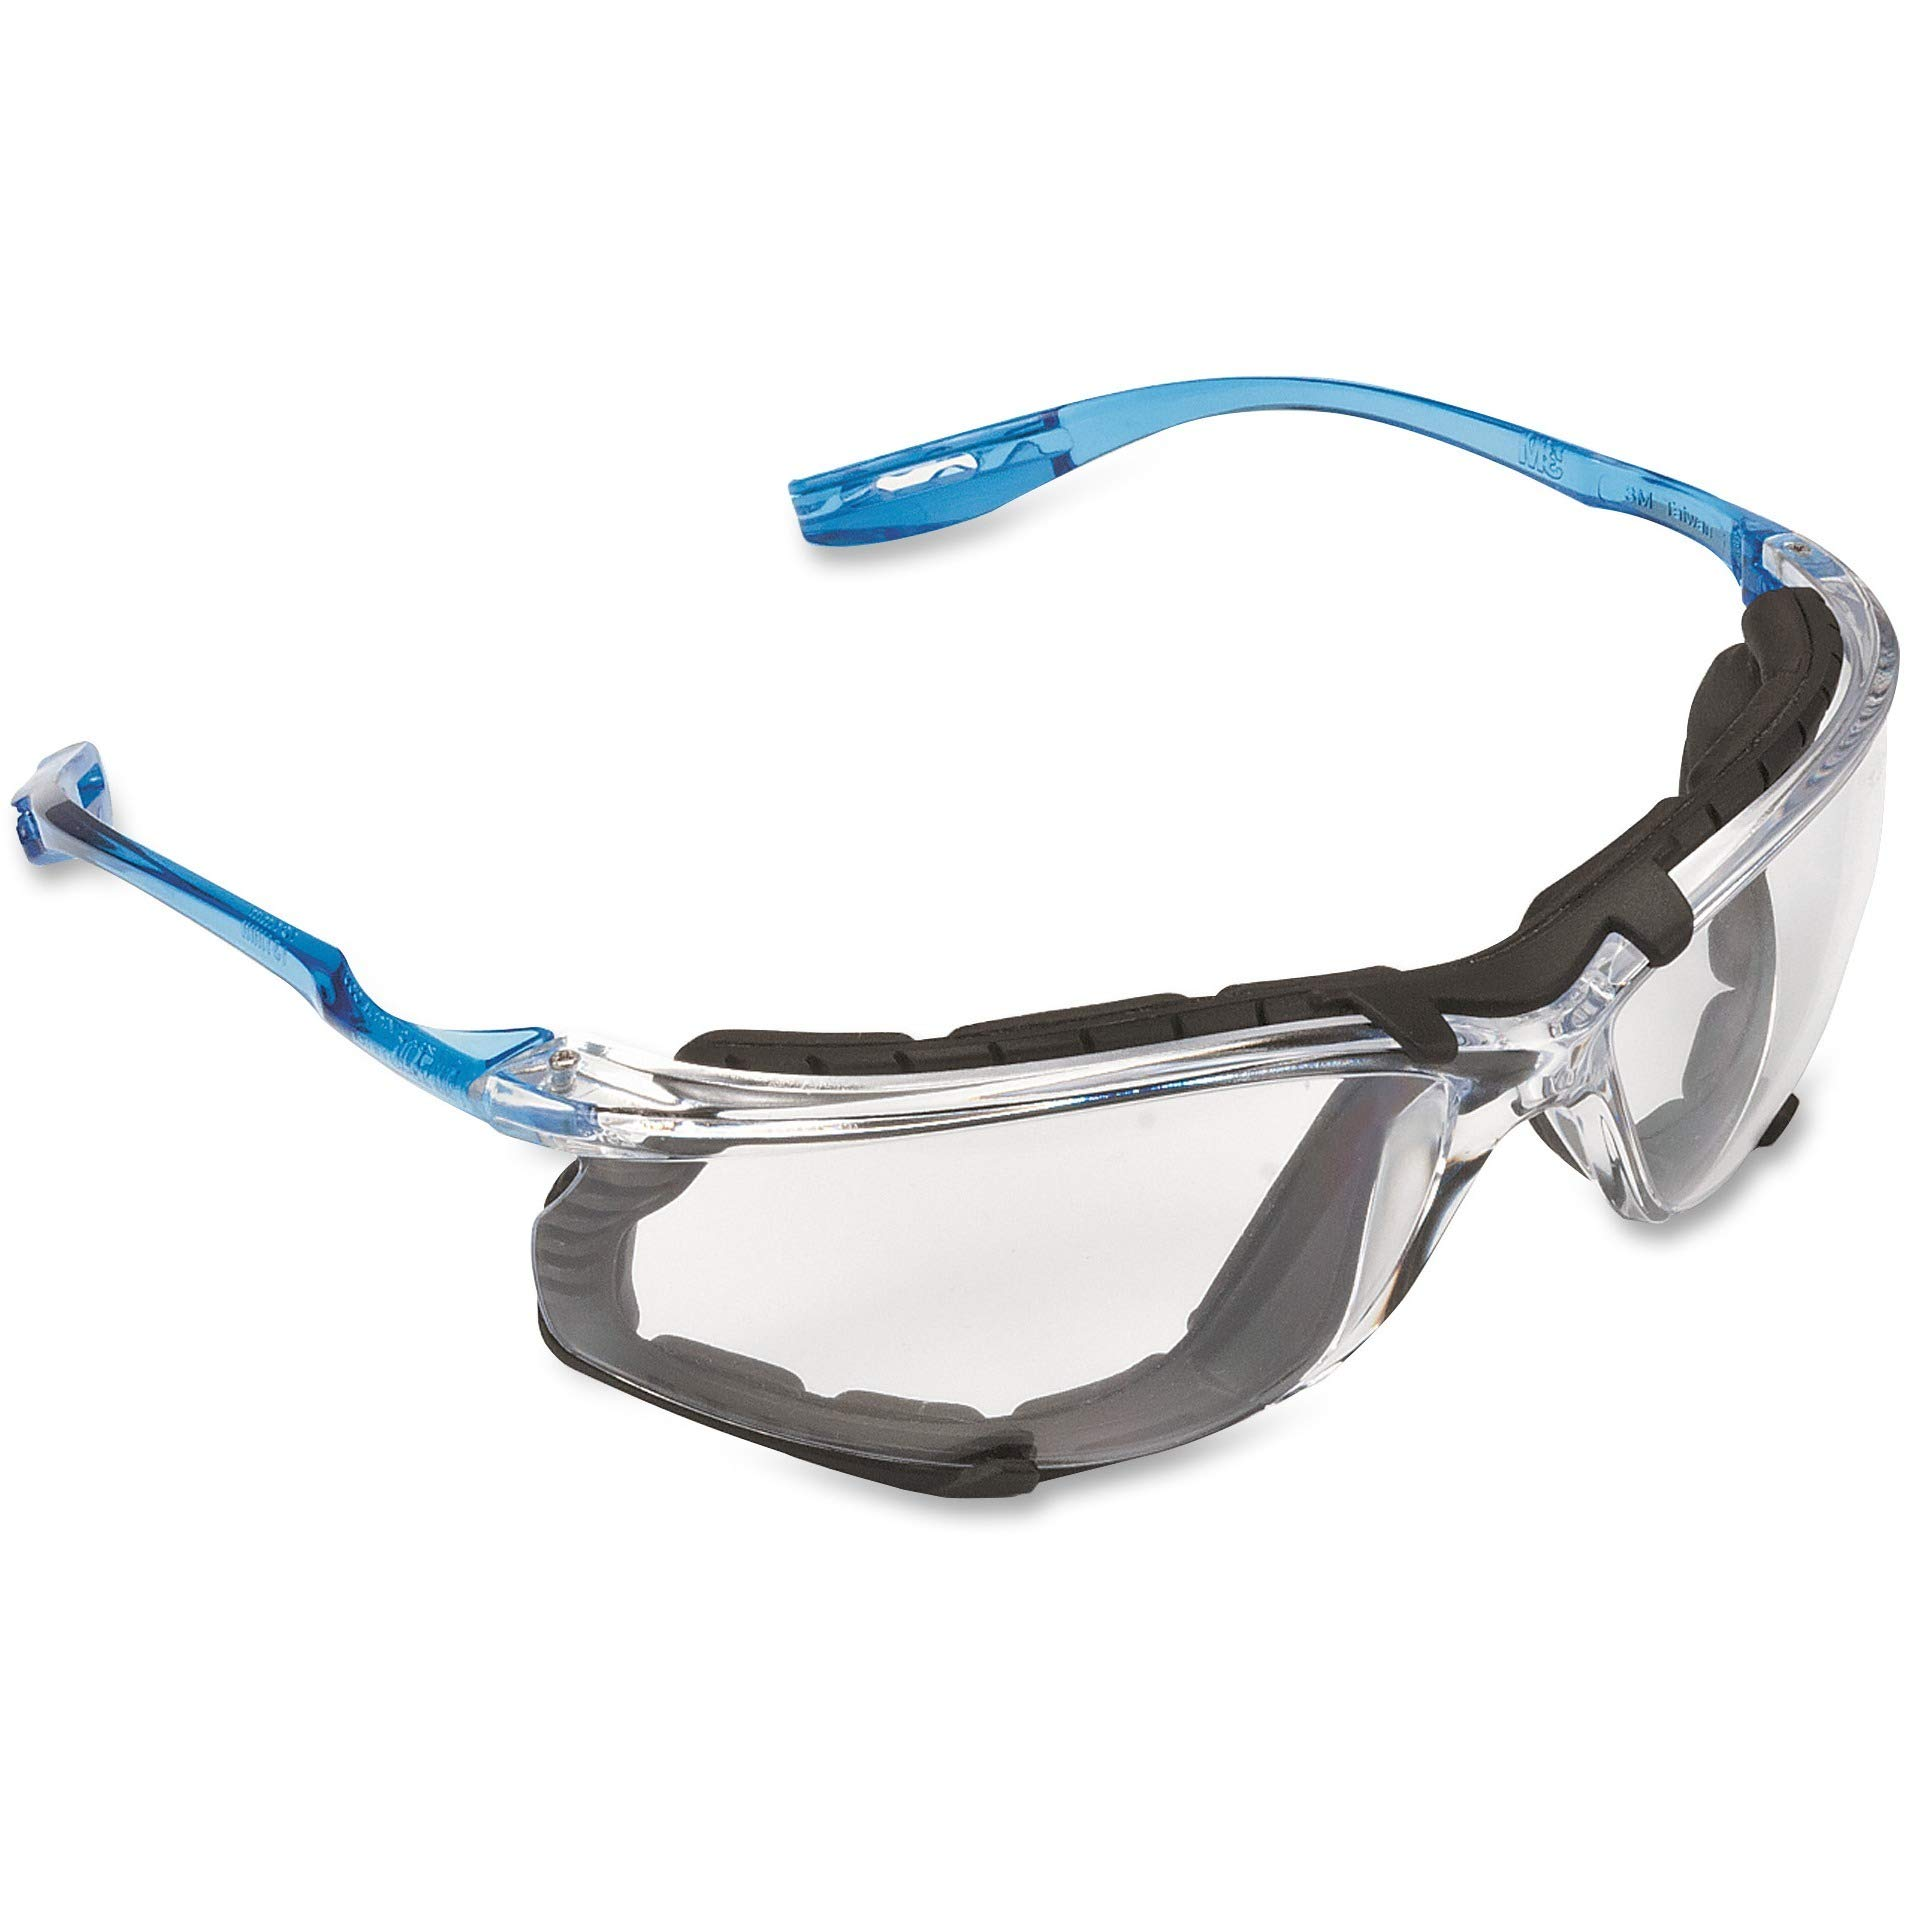 3M Safety Glasses Virtua CCS